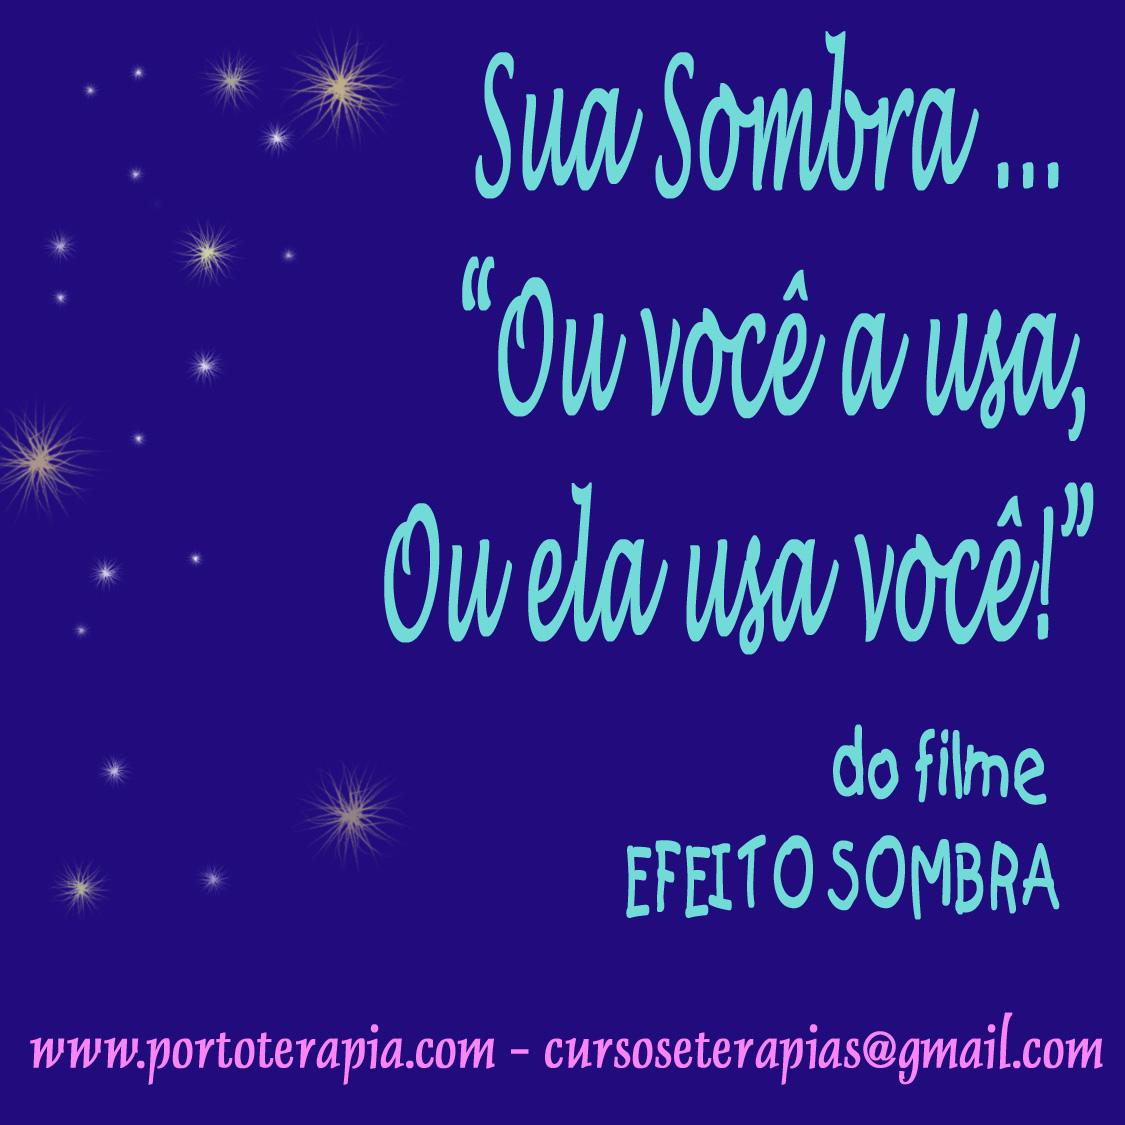 EFEITO SOMBRA.jpg